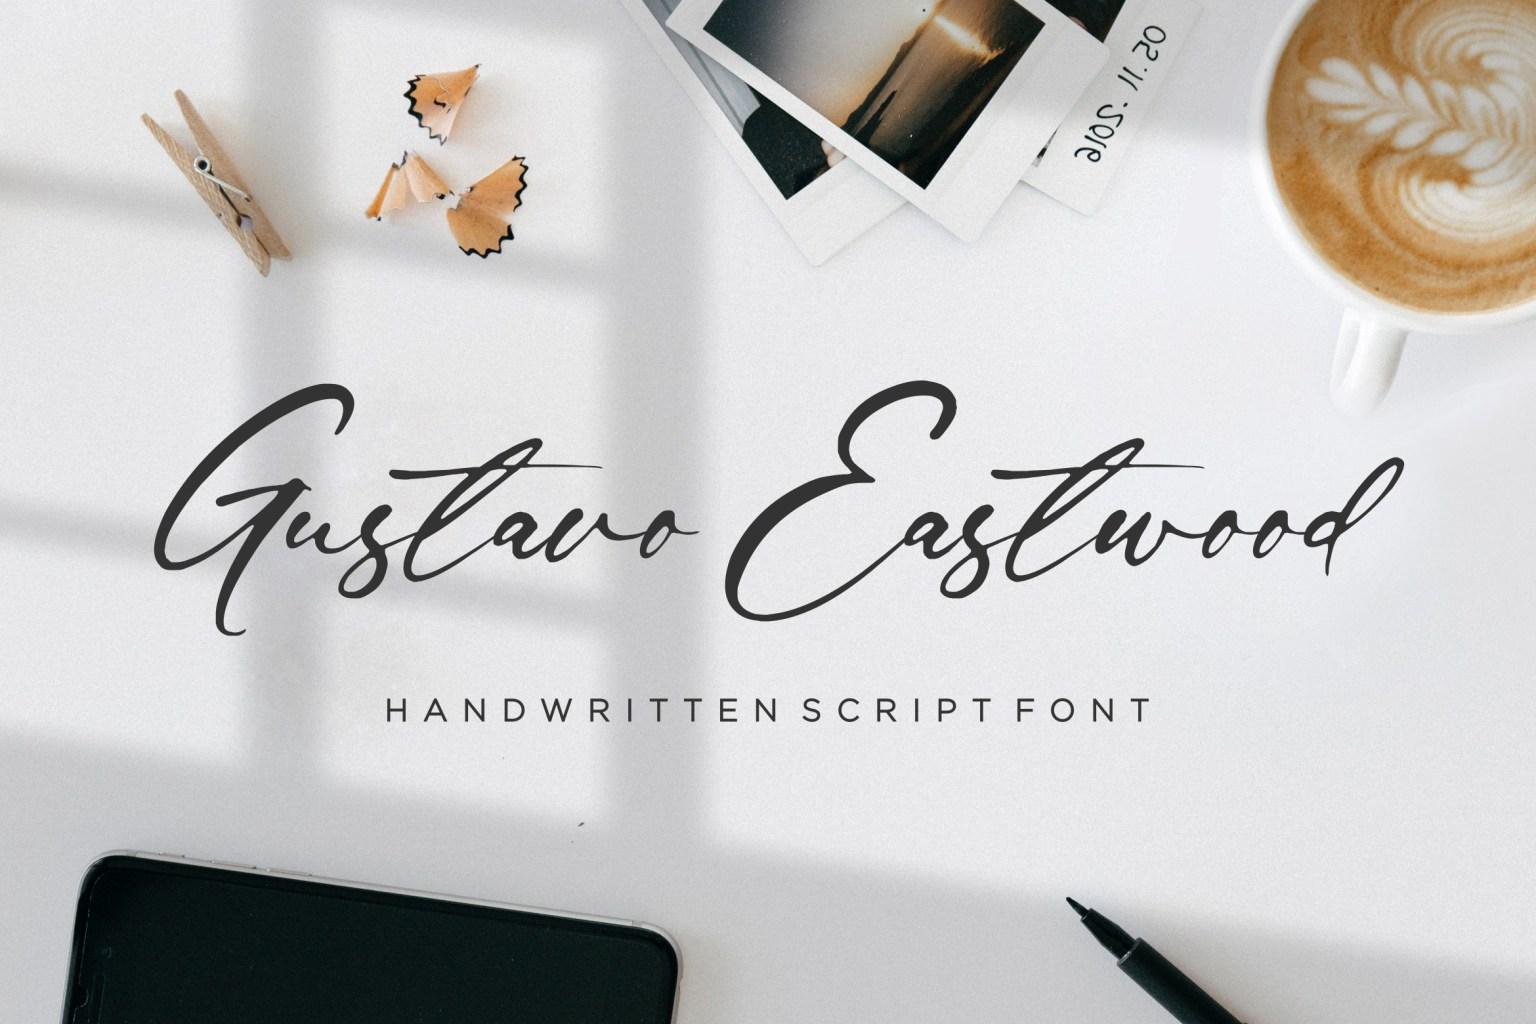 Gustavo Eastwood Script Font